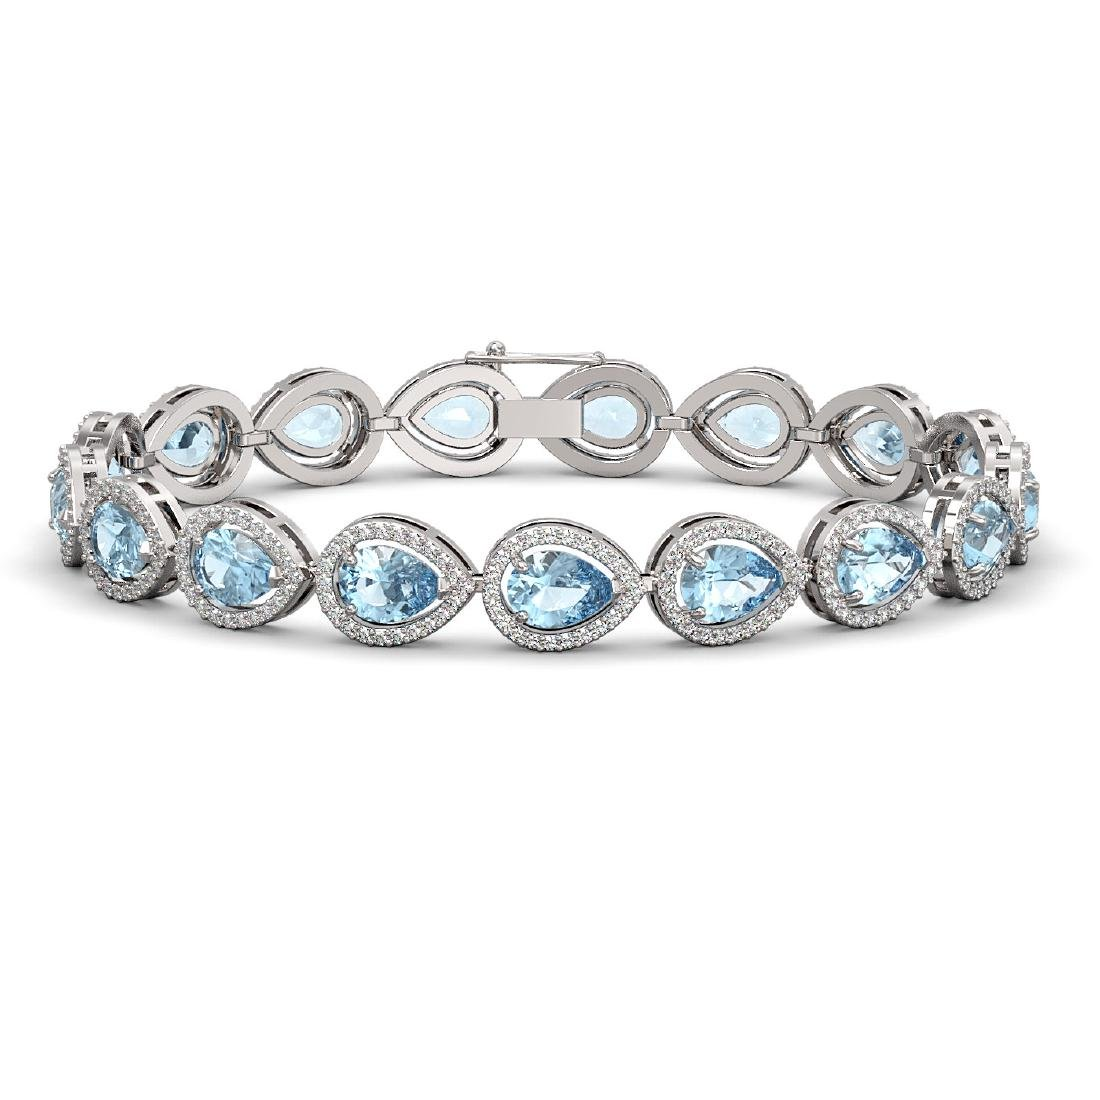 16.59 CTW Sky Topaz & Diamond Halo Bracelet 10K White